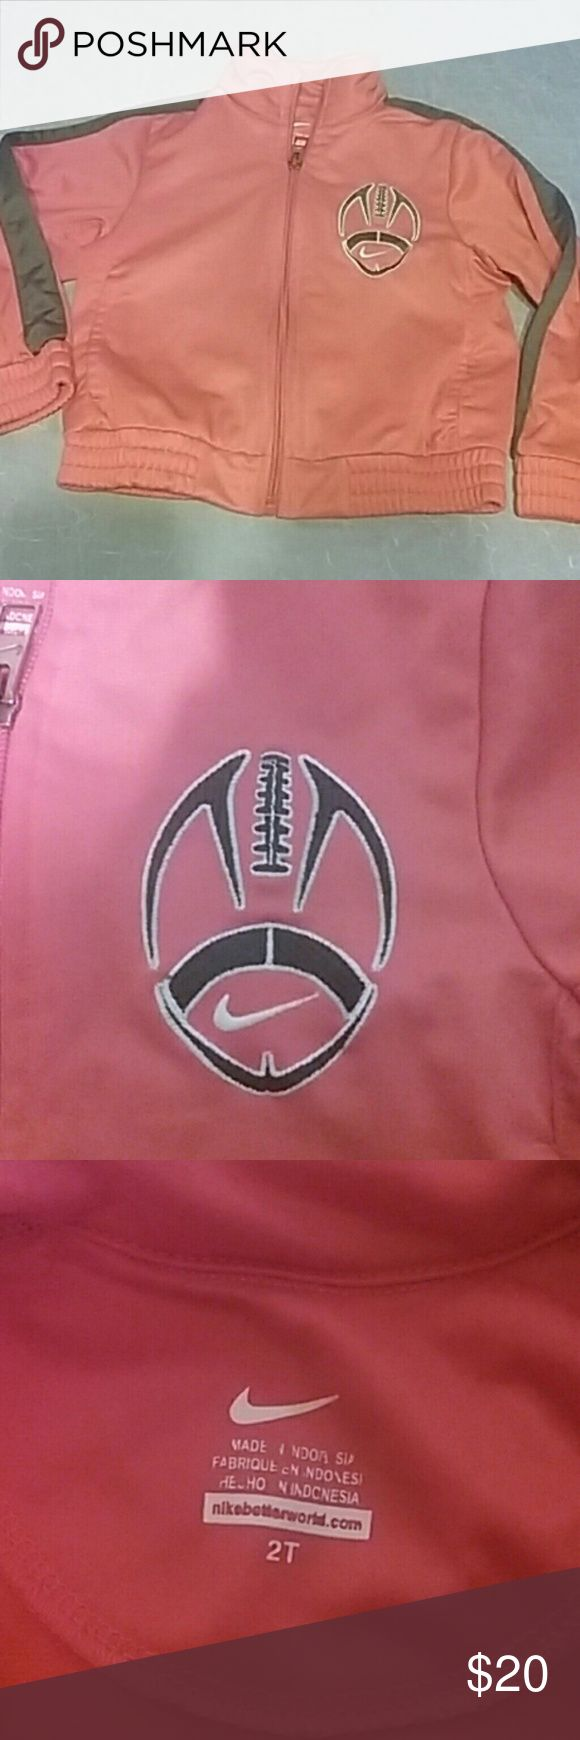 Nike football Jacket Orange with gray trim Nike jacket with football. Boys 2T worn once. Nike Jackets & Coats